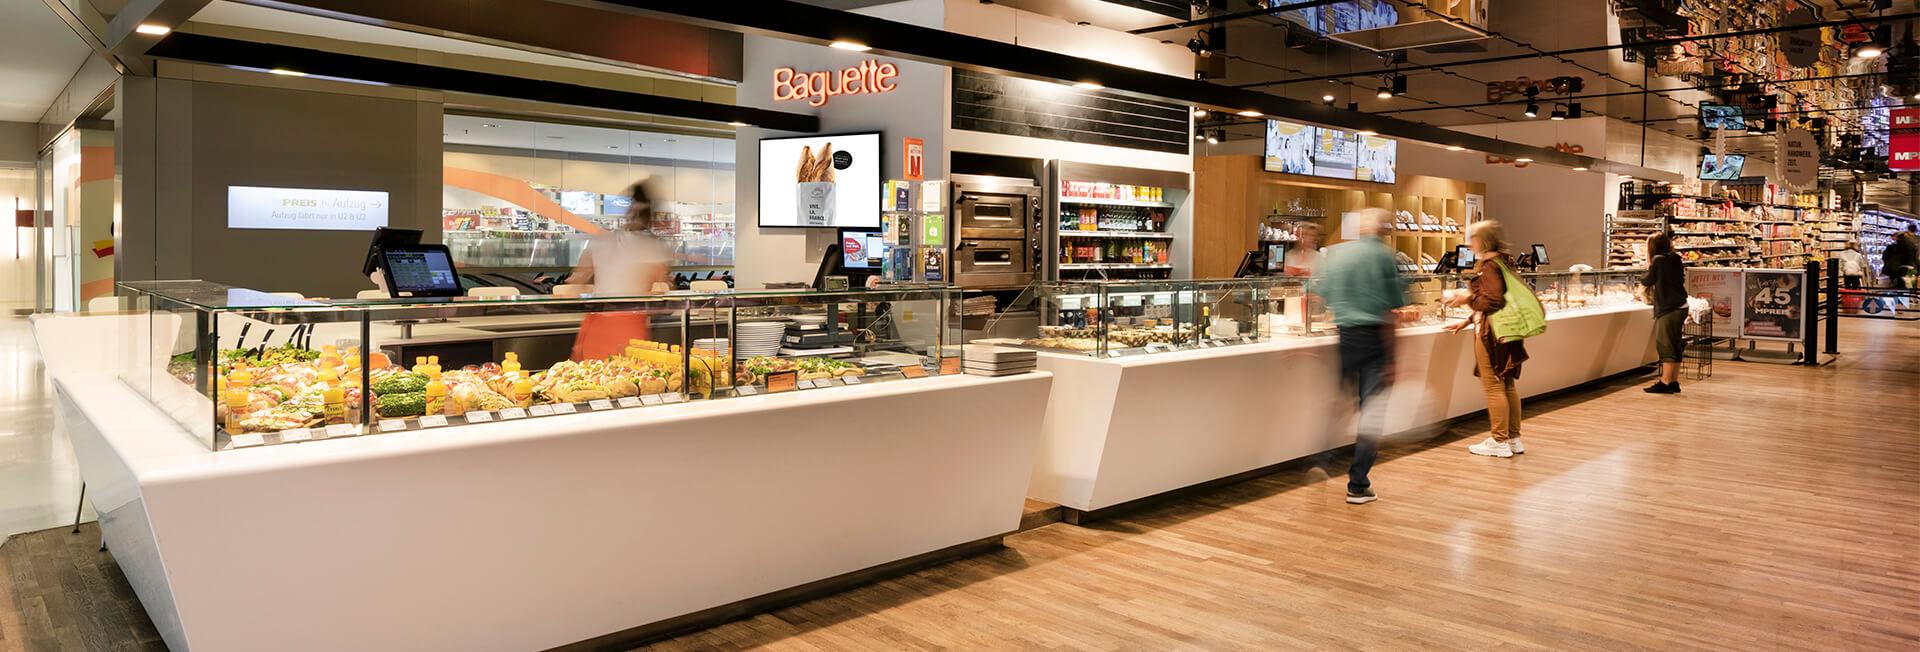 Baguette im Kaufhaus Tyrol